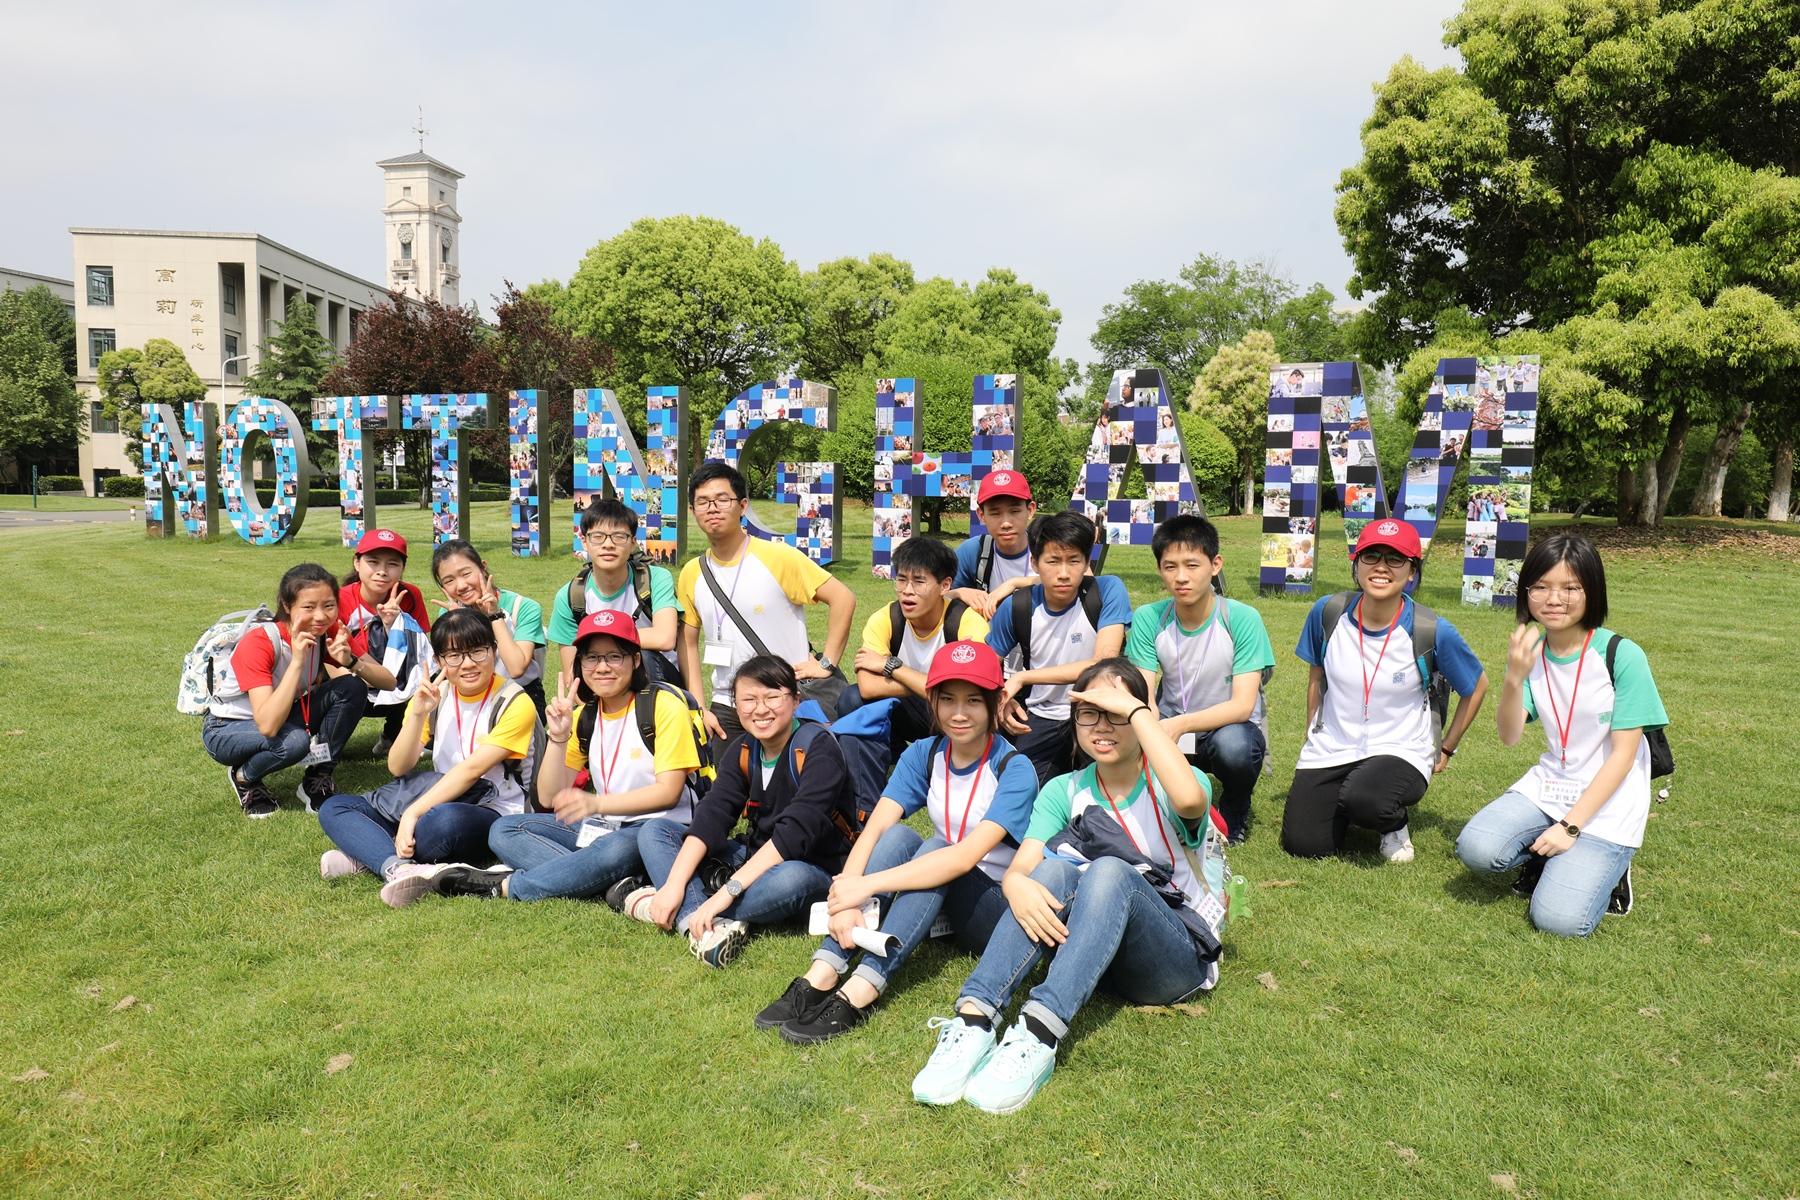 http://npc.edu.hk/sites/default/files/kcng2369.jpg